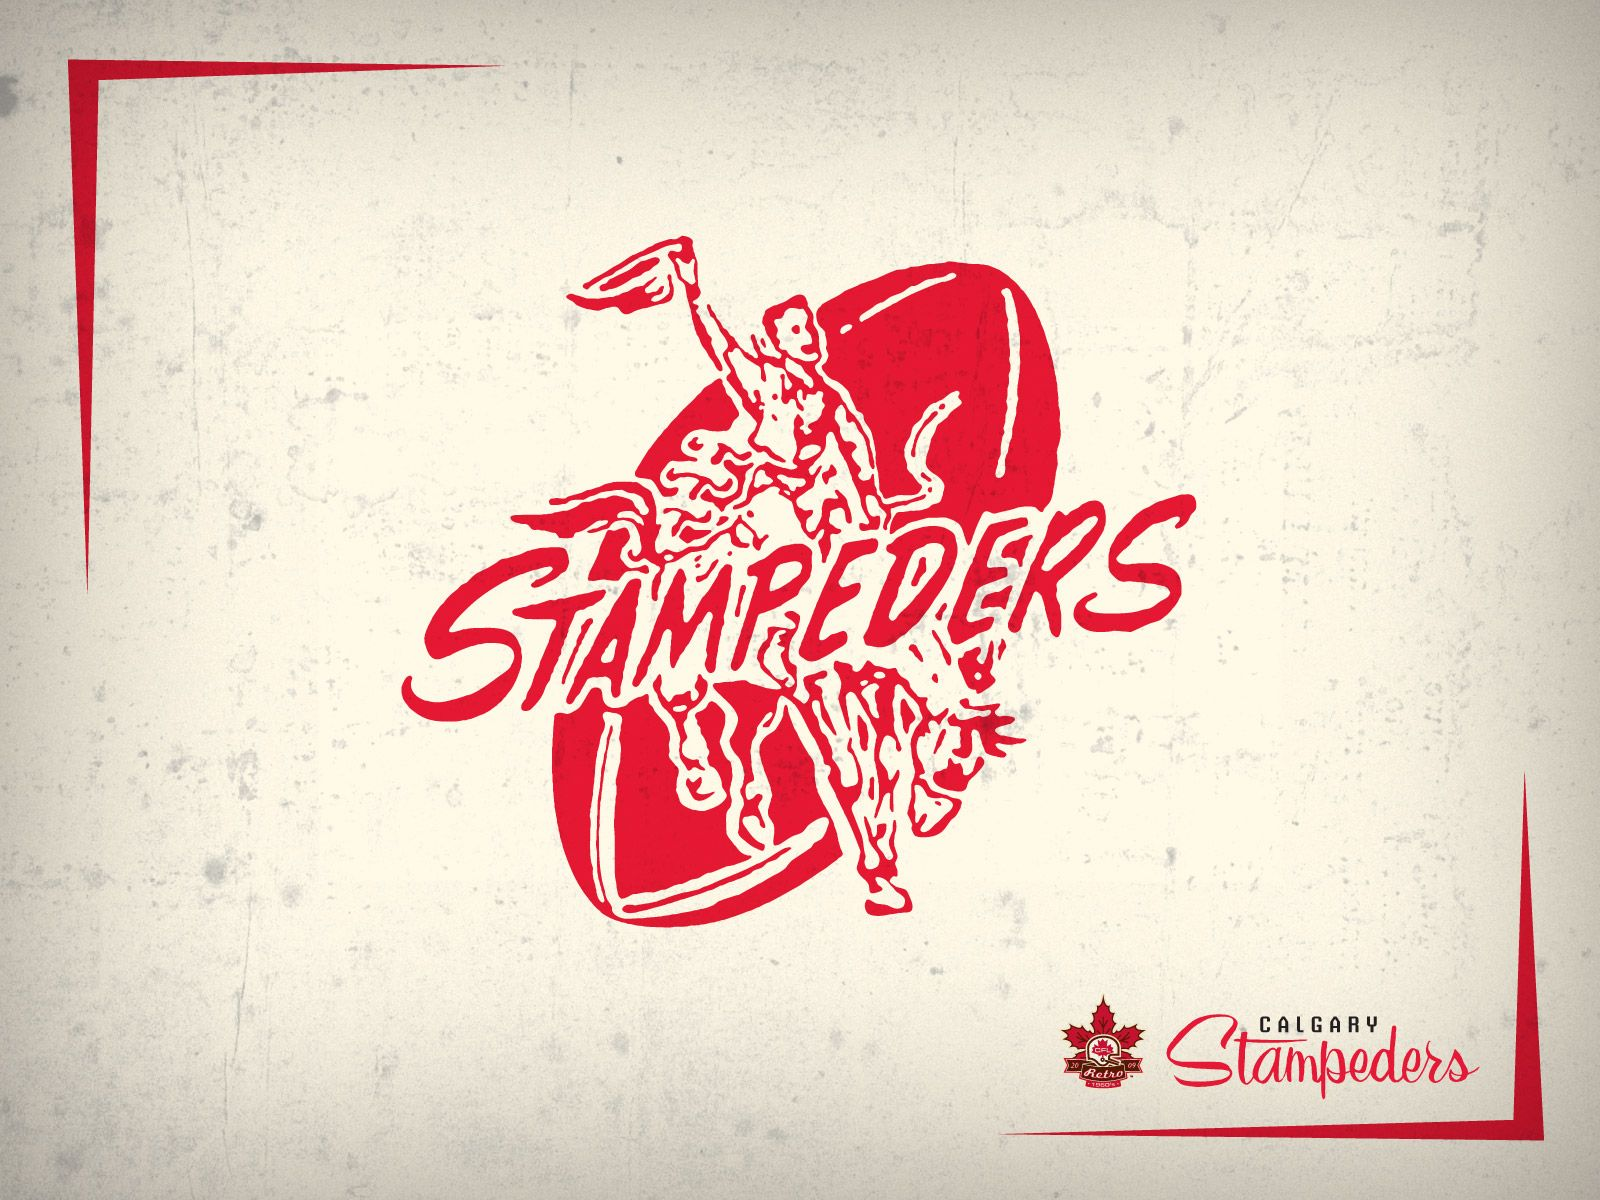 Calgary Stampeders Retro Logo Cfl Canadian Football